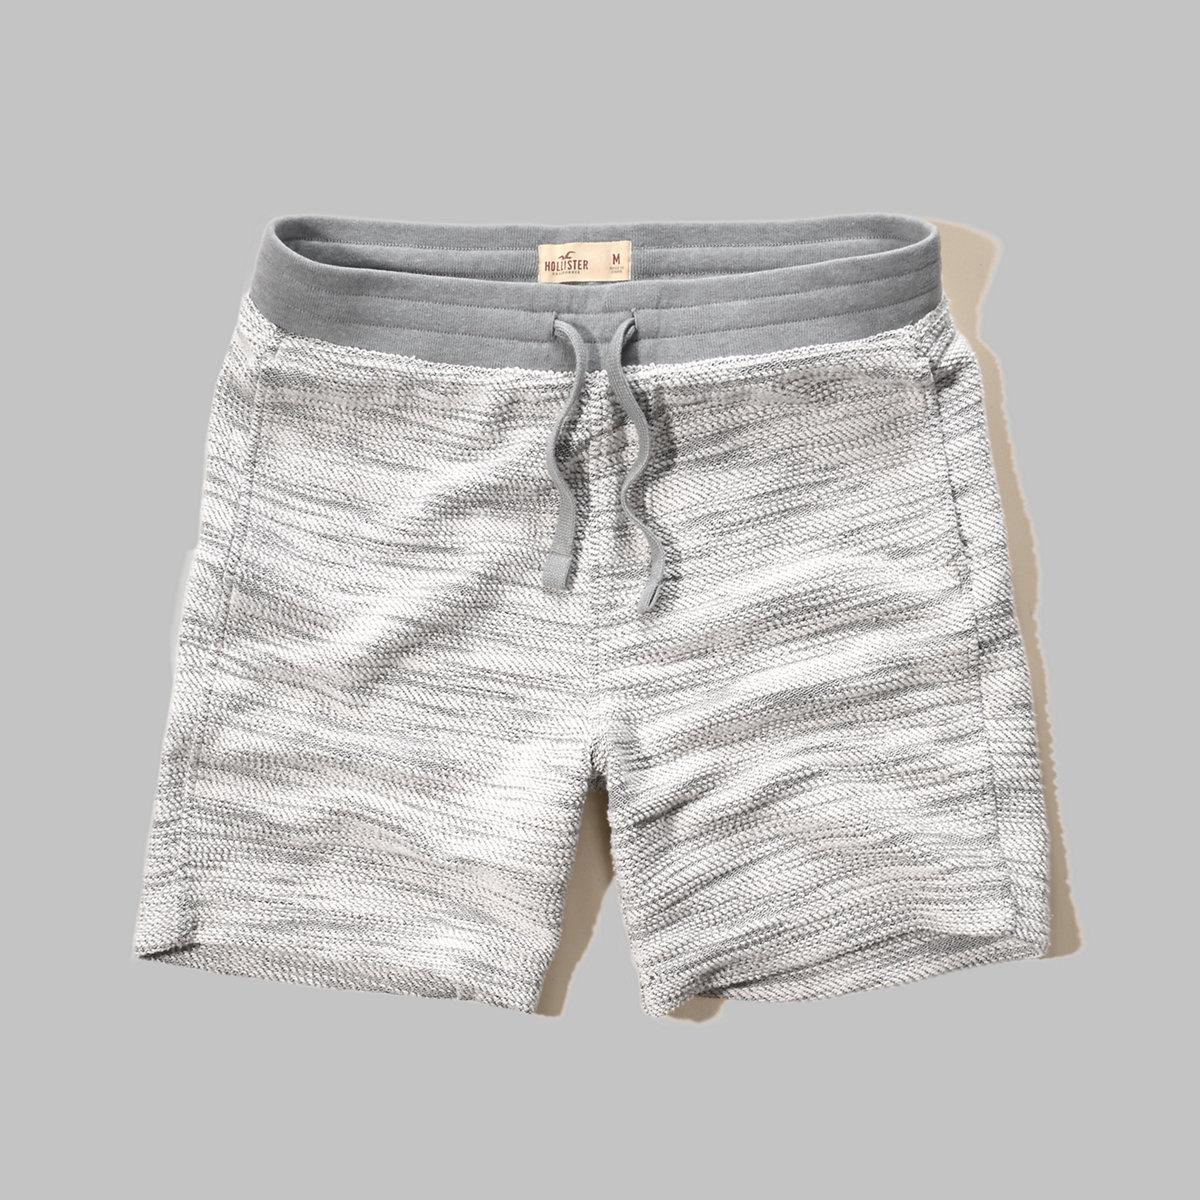 Hollister Beach Prep Fit Jogger Shorts